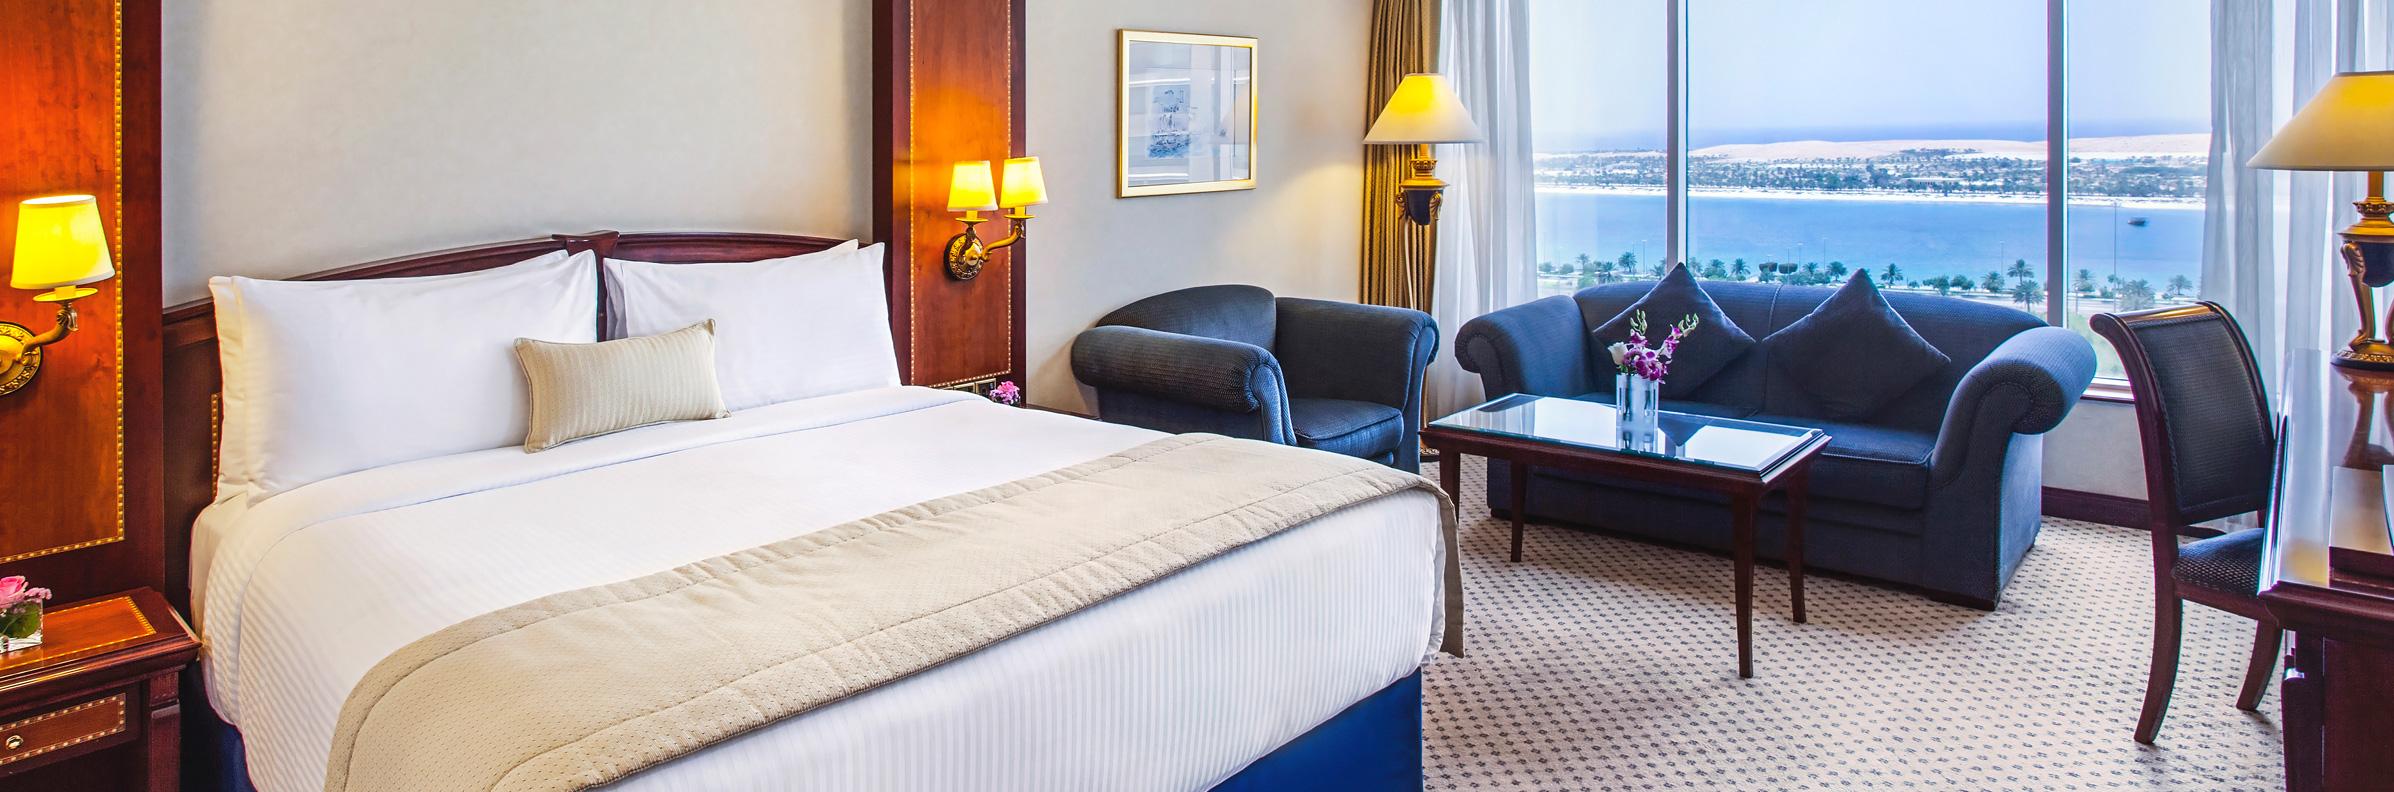 Rooms Suites Corniche Hotel Abu Dhabi